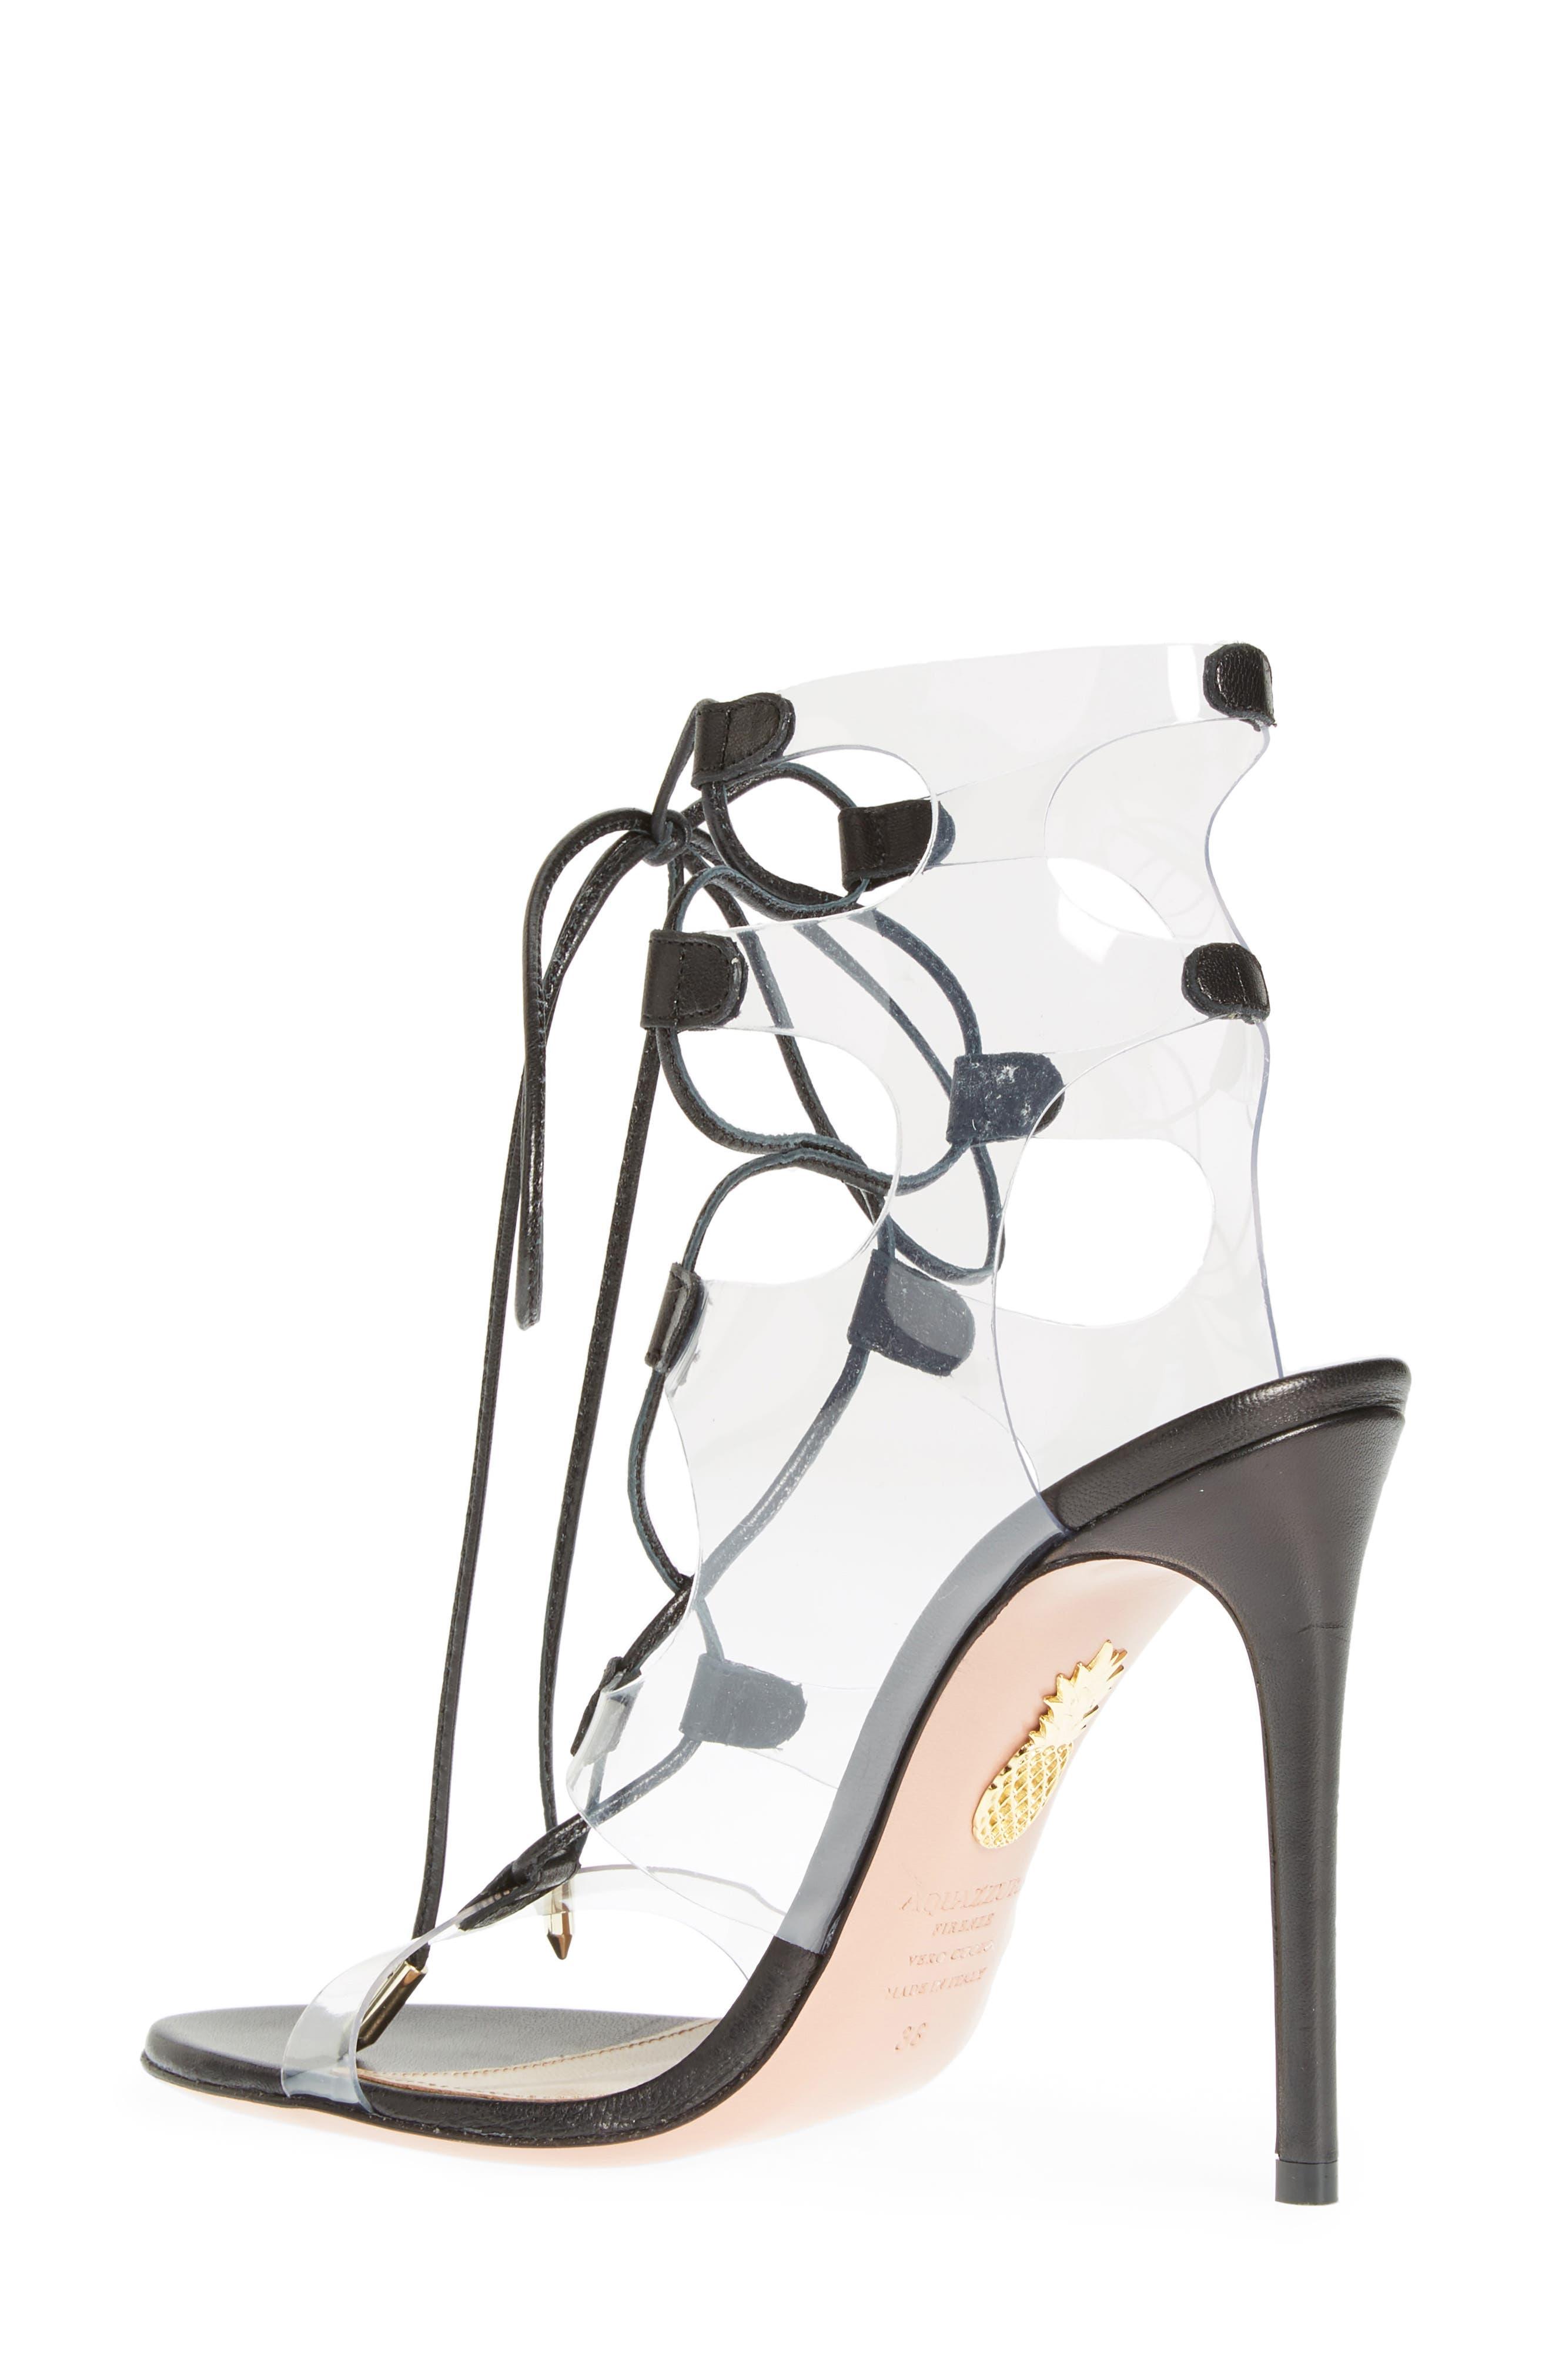 AQUAZZURA, Milos PVC Lace-Up Sandal, Alternate thumbnail 2, color, BLACK